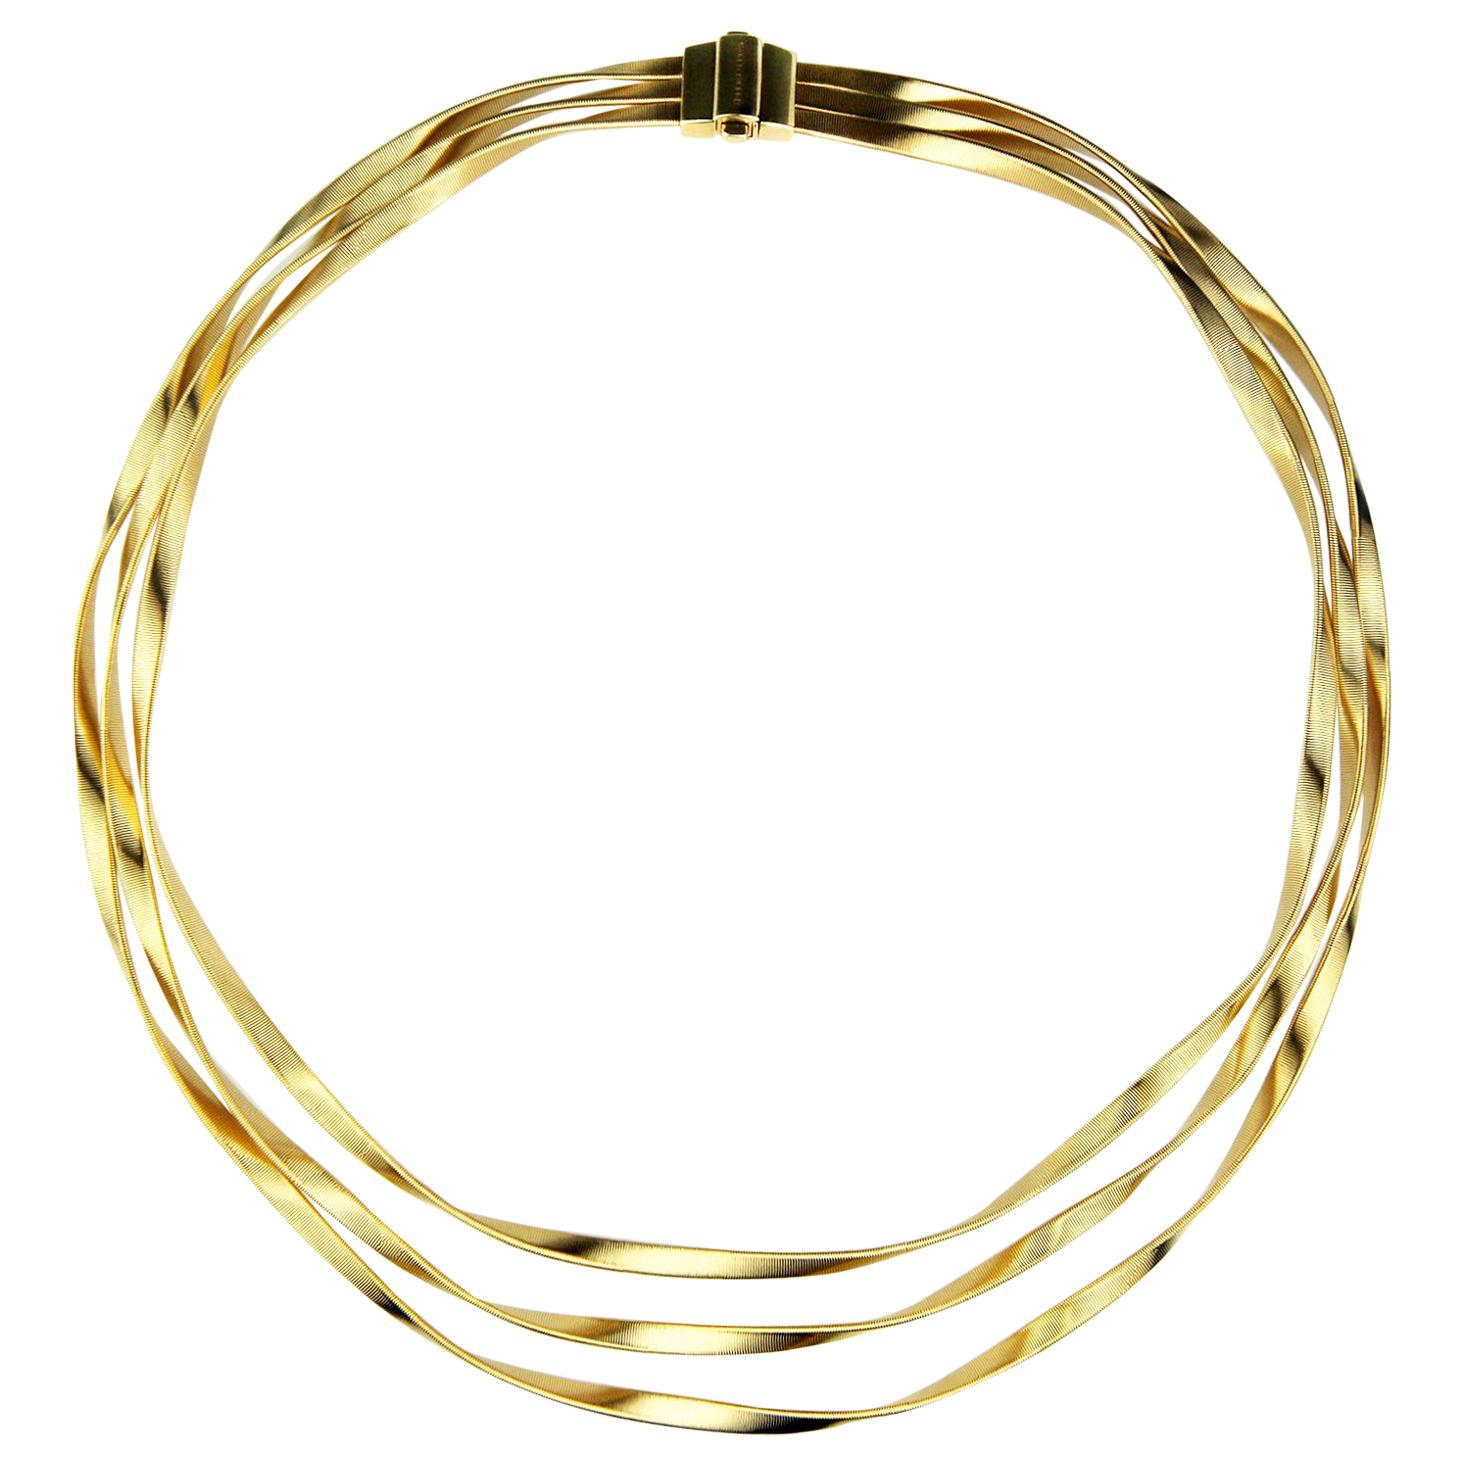 Marco Bicego Marrakech 18 Karat Yellow Gold Three-Strand Collar Necklace